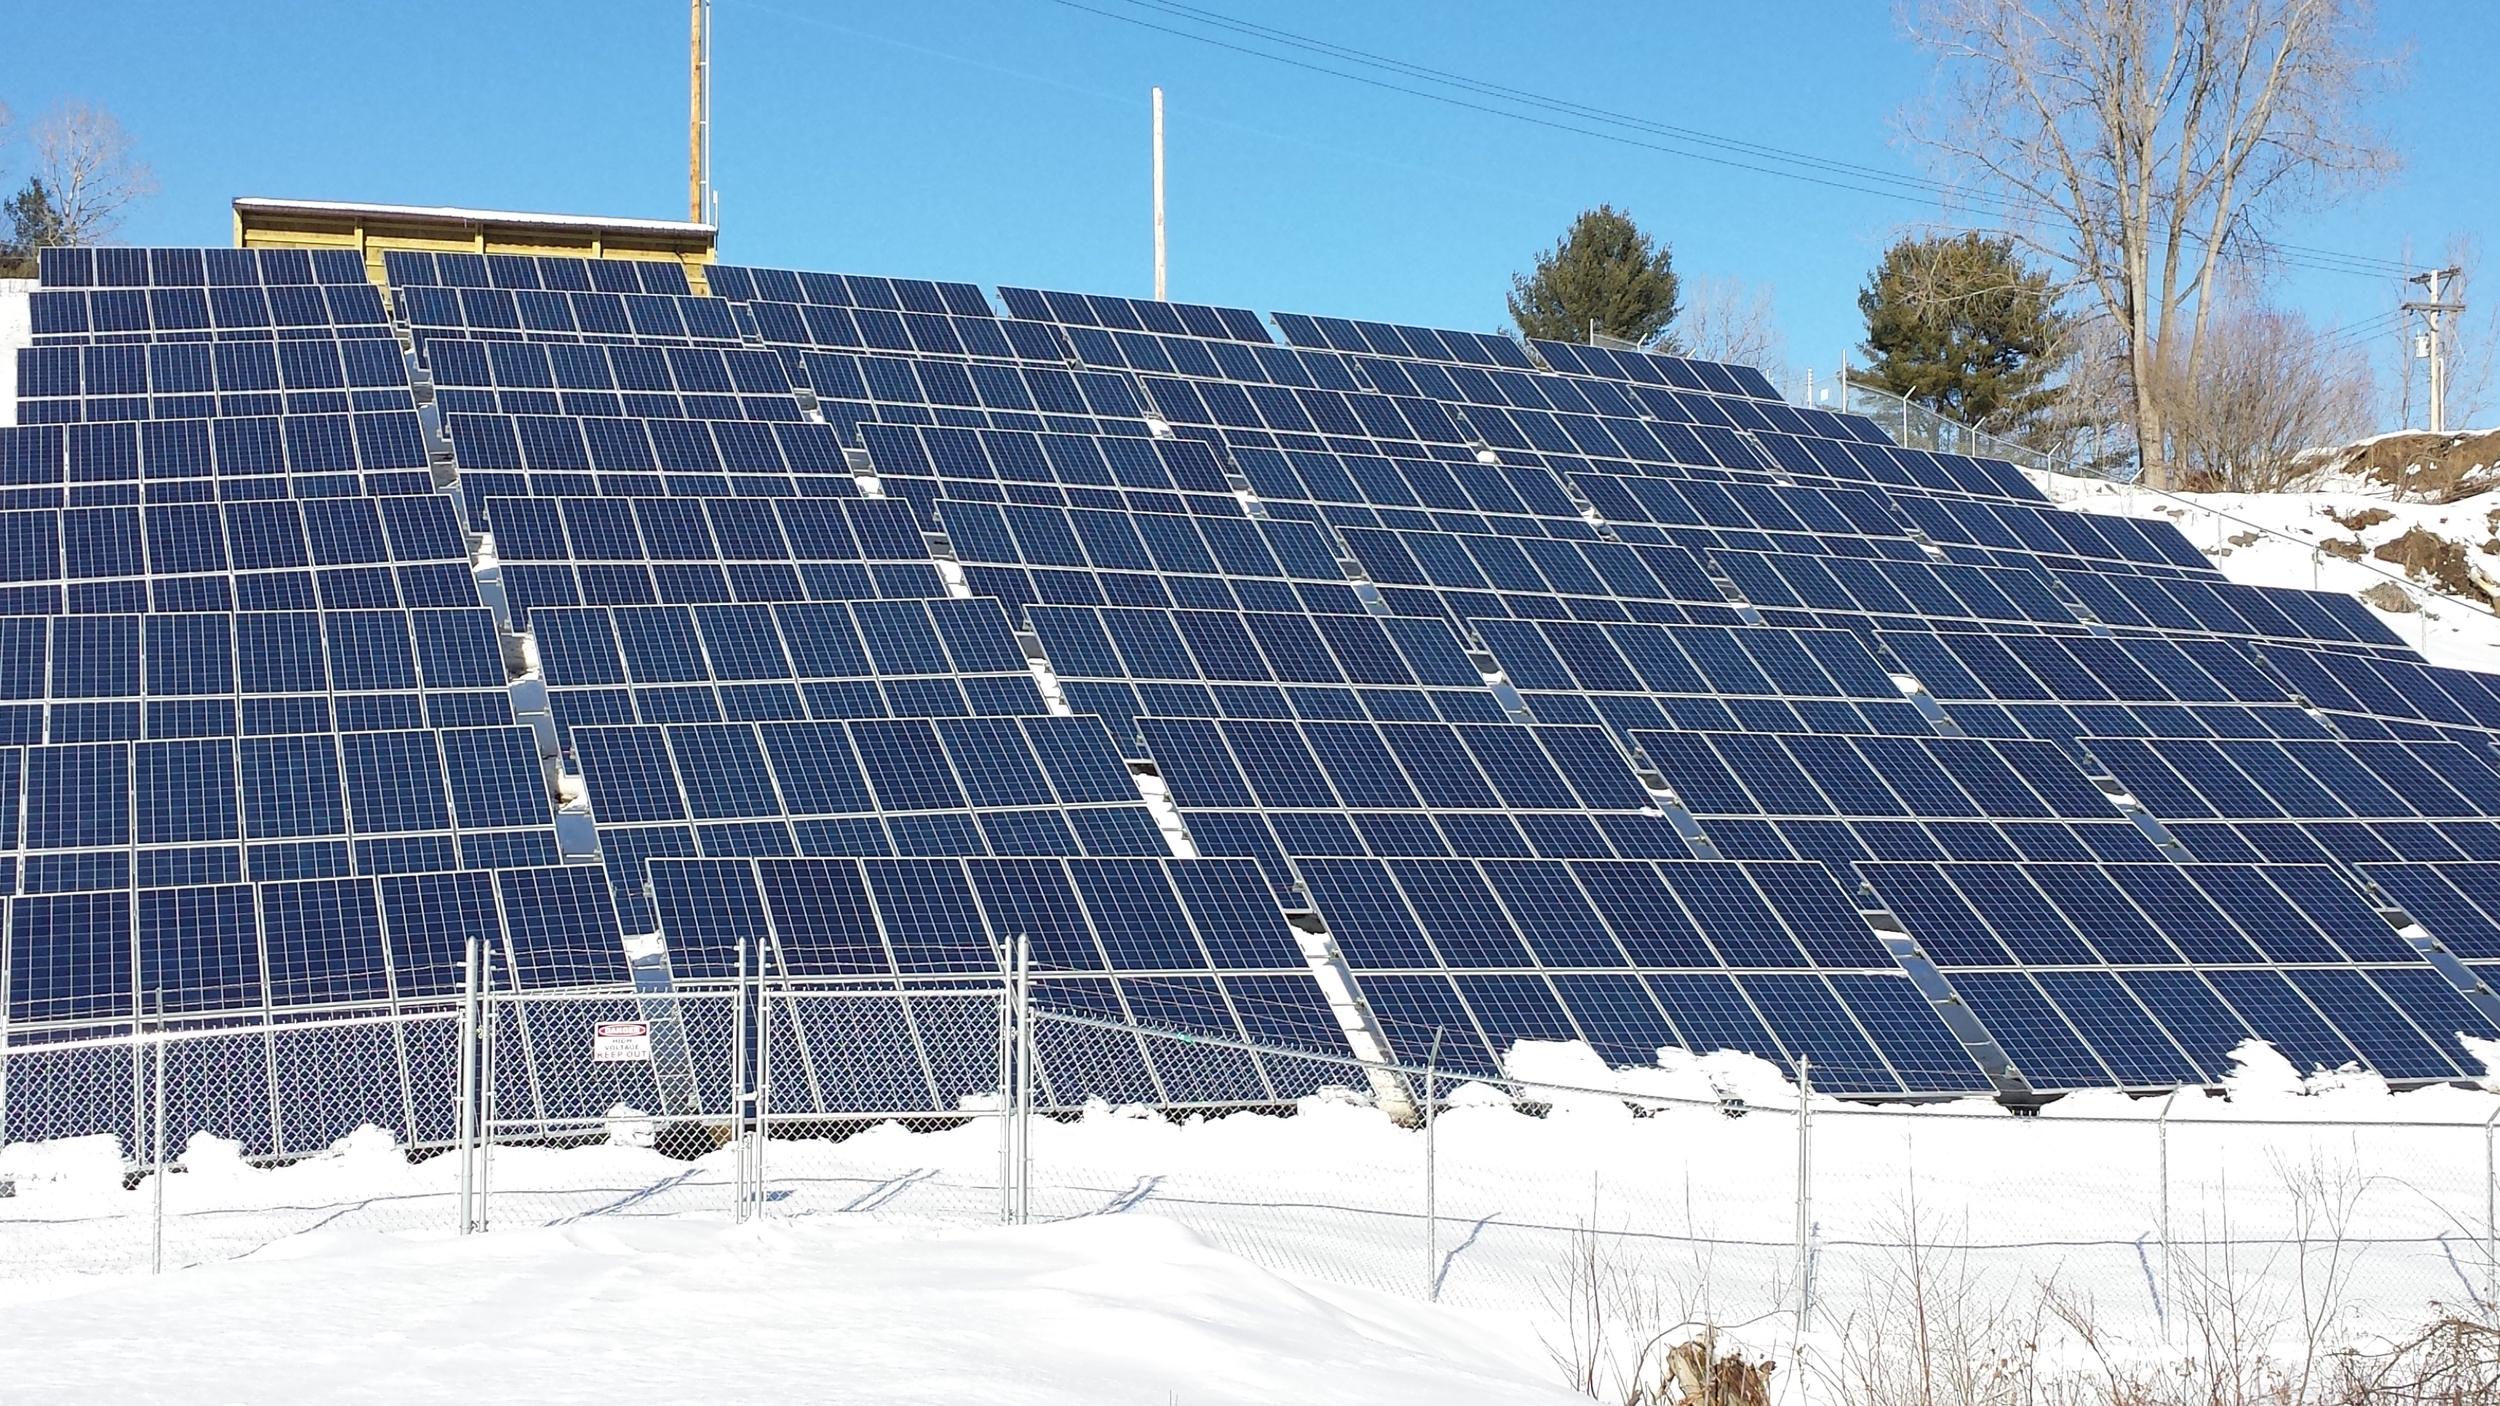 Cavendish Municipal Solar Array1.jpg